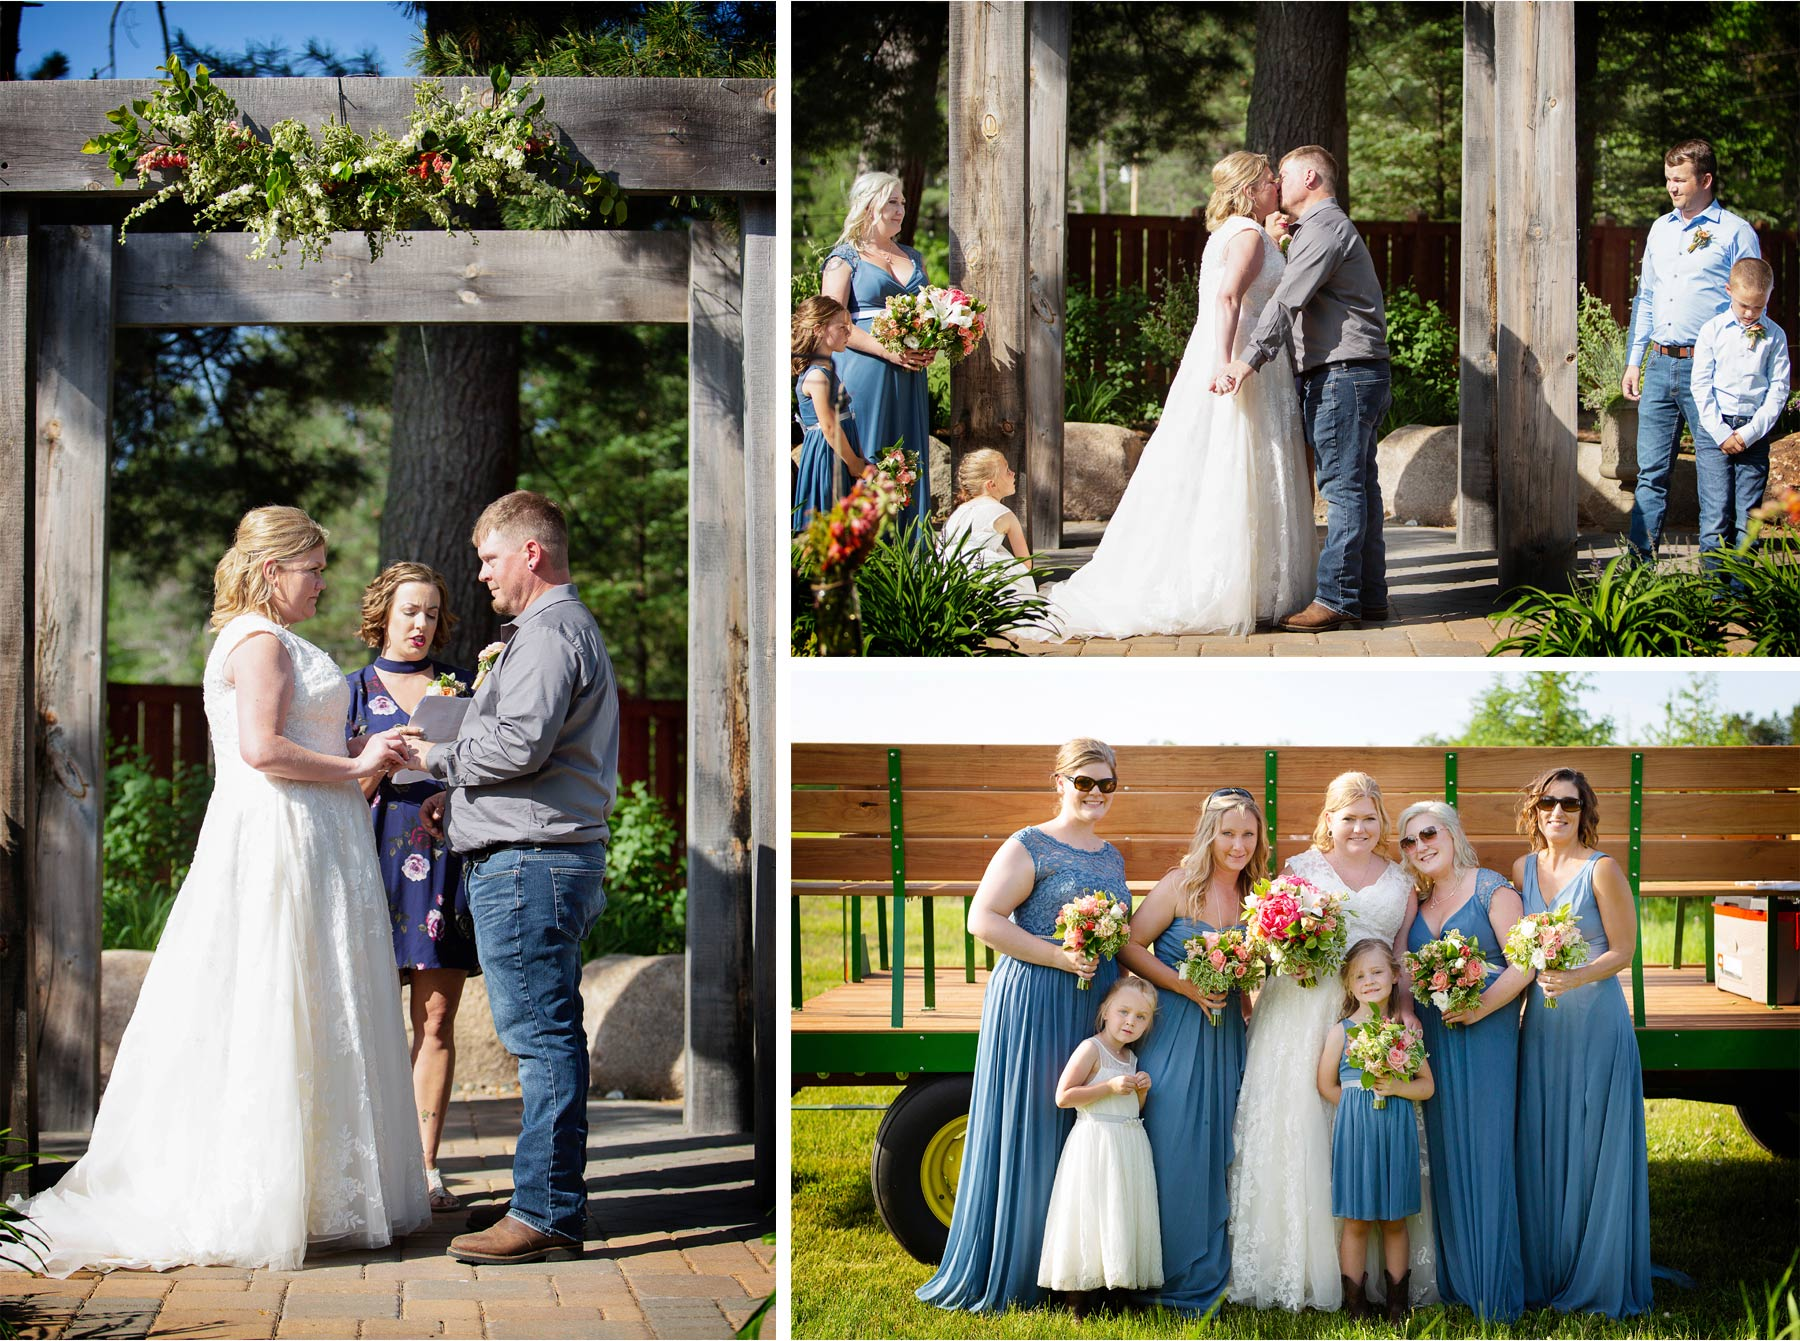 09-Vick-Photography-Wedding-Brainerd-Minnesota-Pine-Peaks-Lodge-Cabin-Rustic-Outdoor-Ceremony-Kristi-and-Noel.jpg